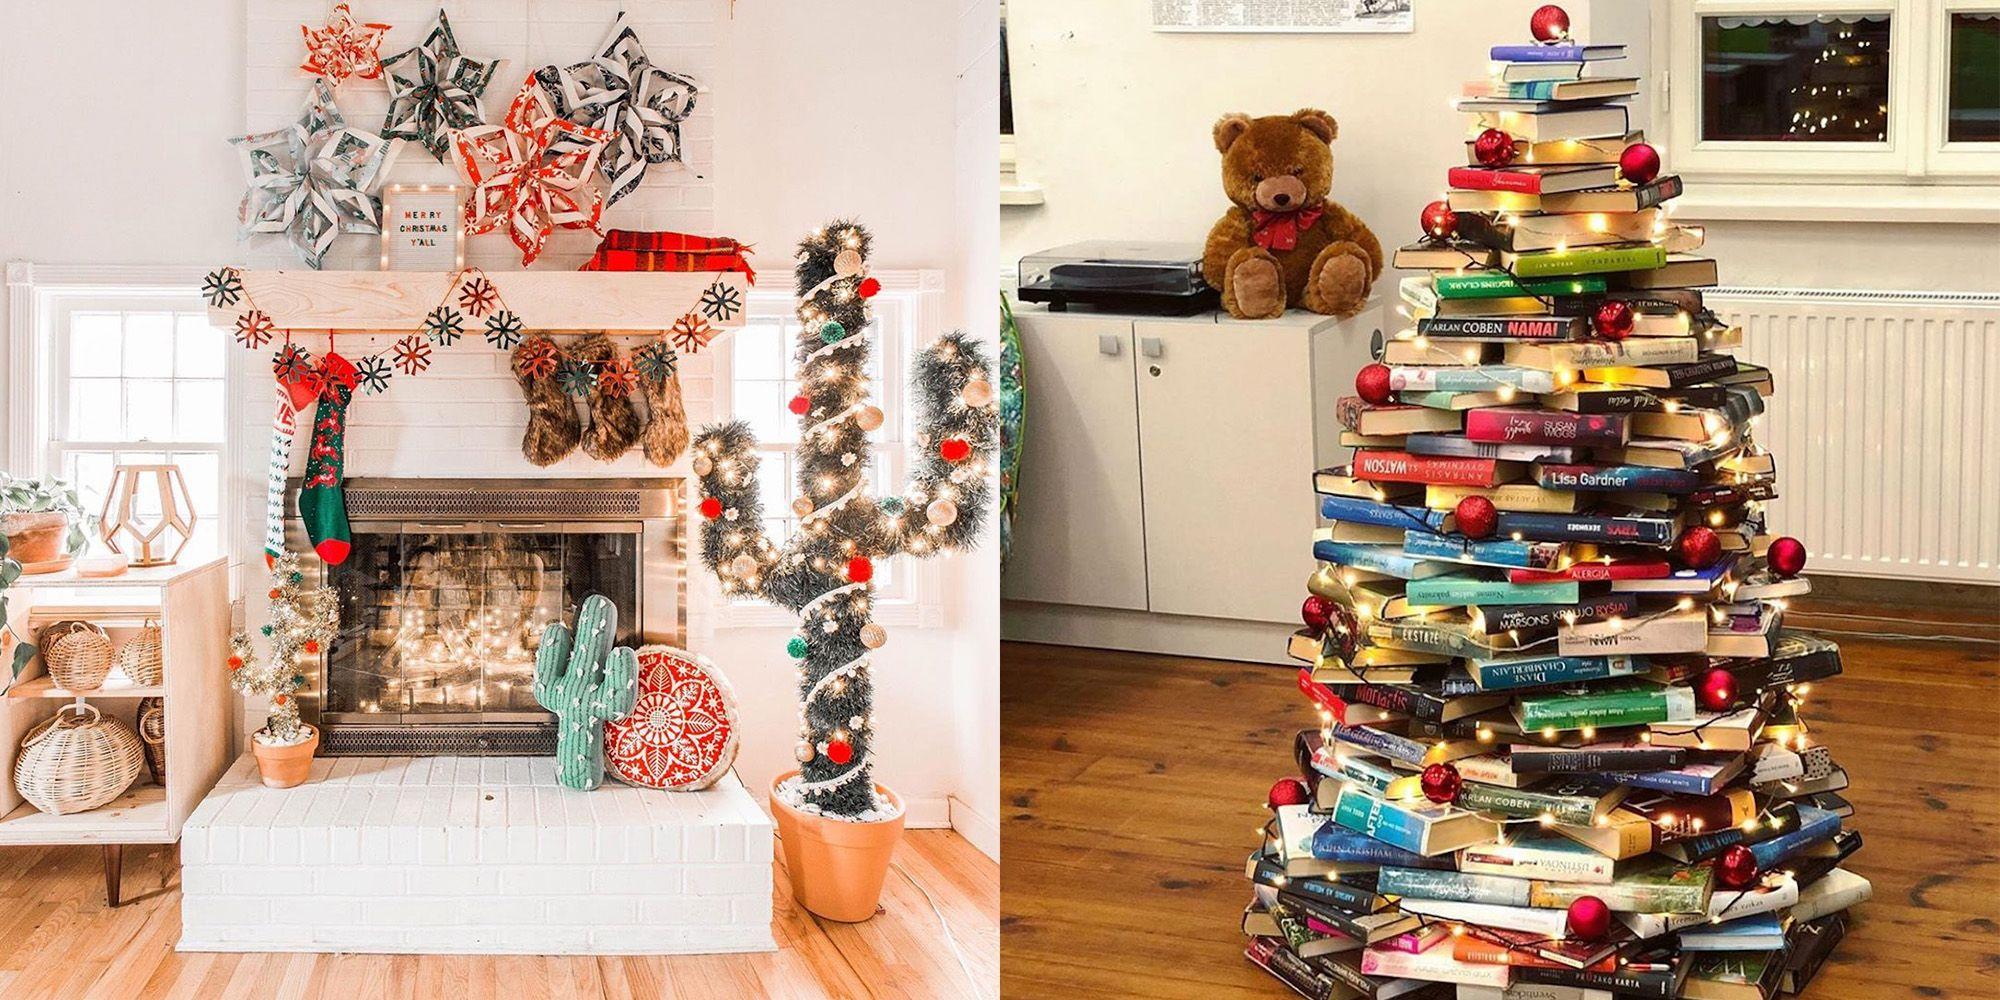 25 Alternative Christmas Tree Ideas Festive Styles For Small Spaces